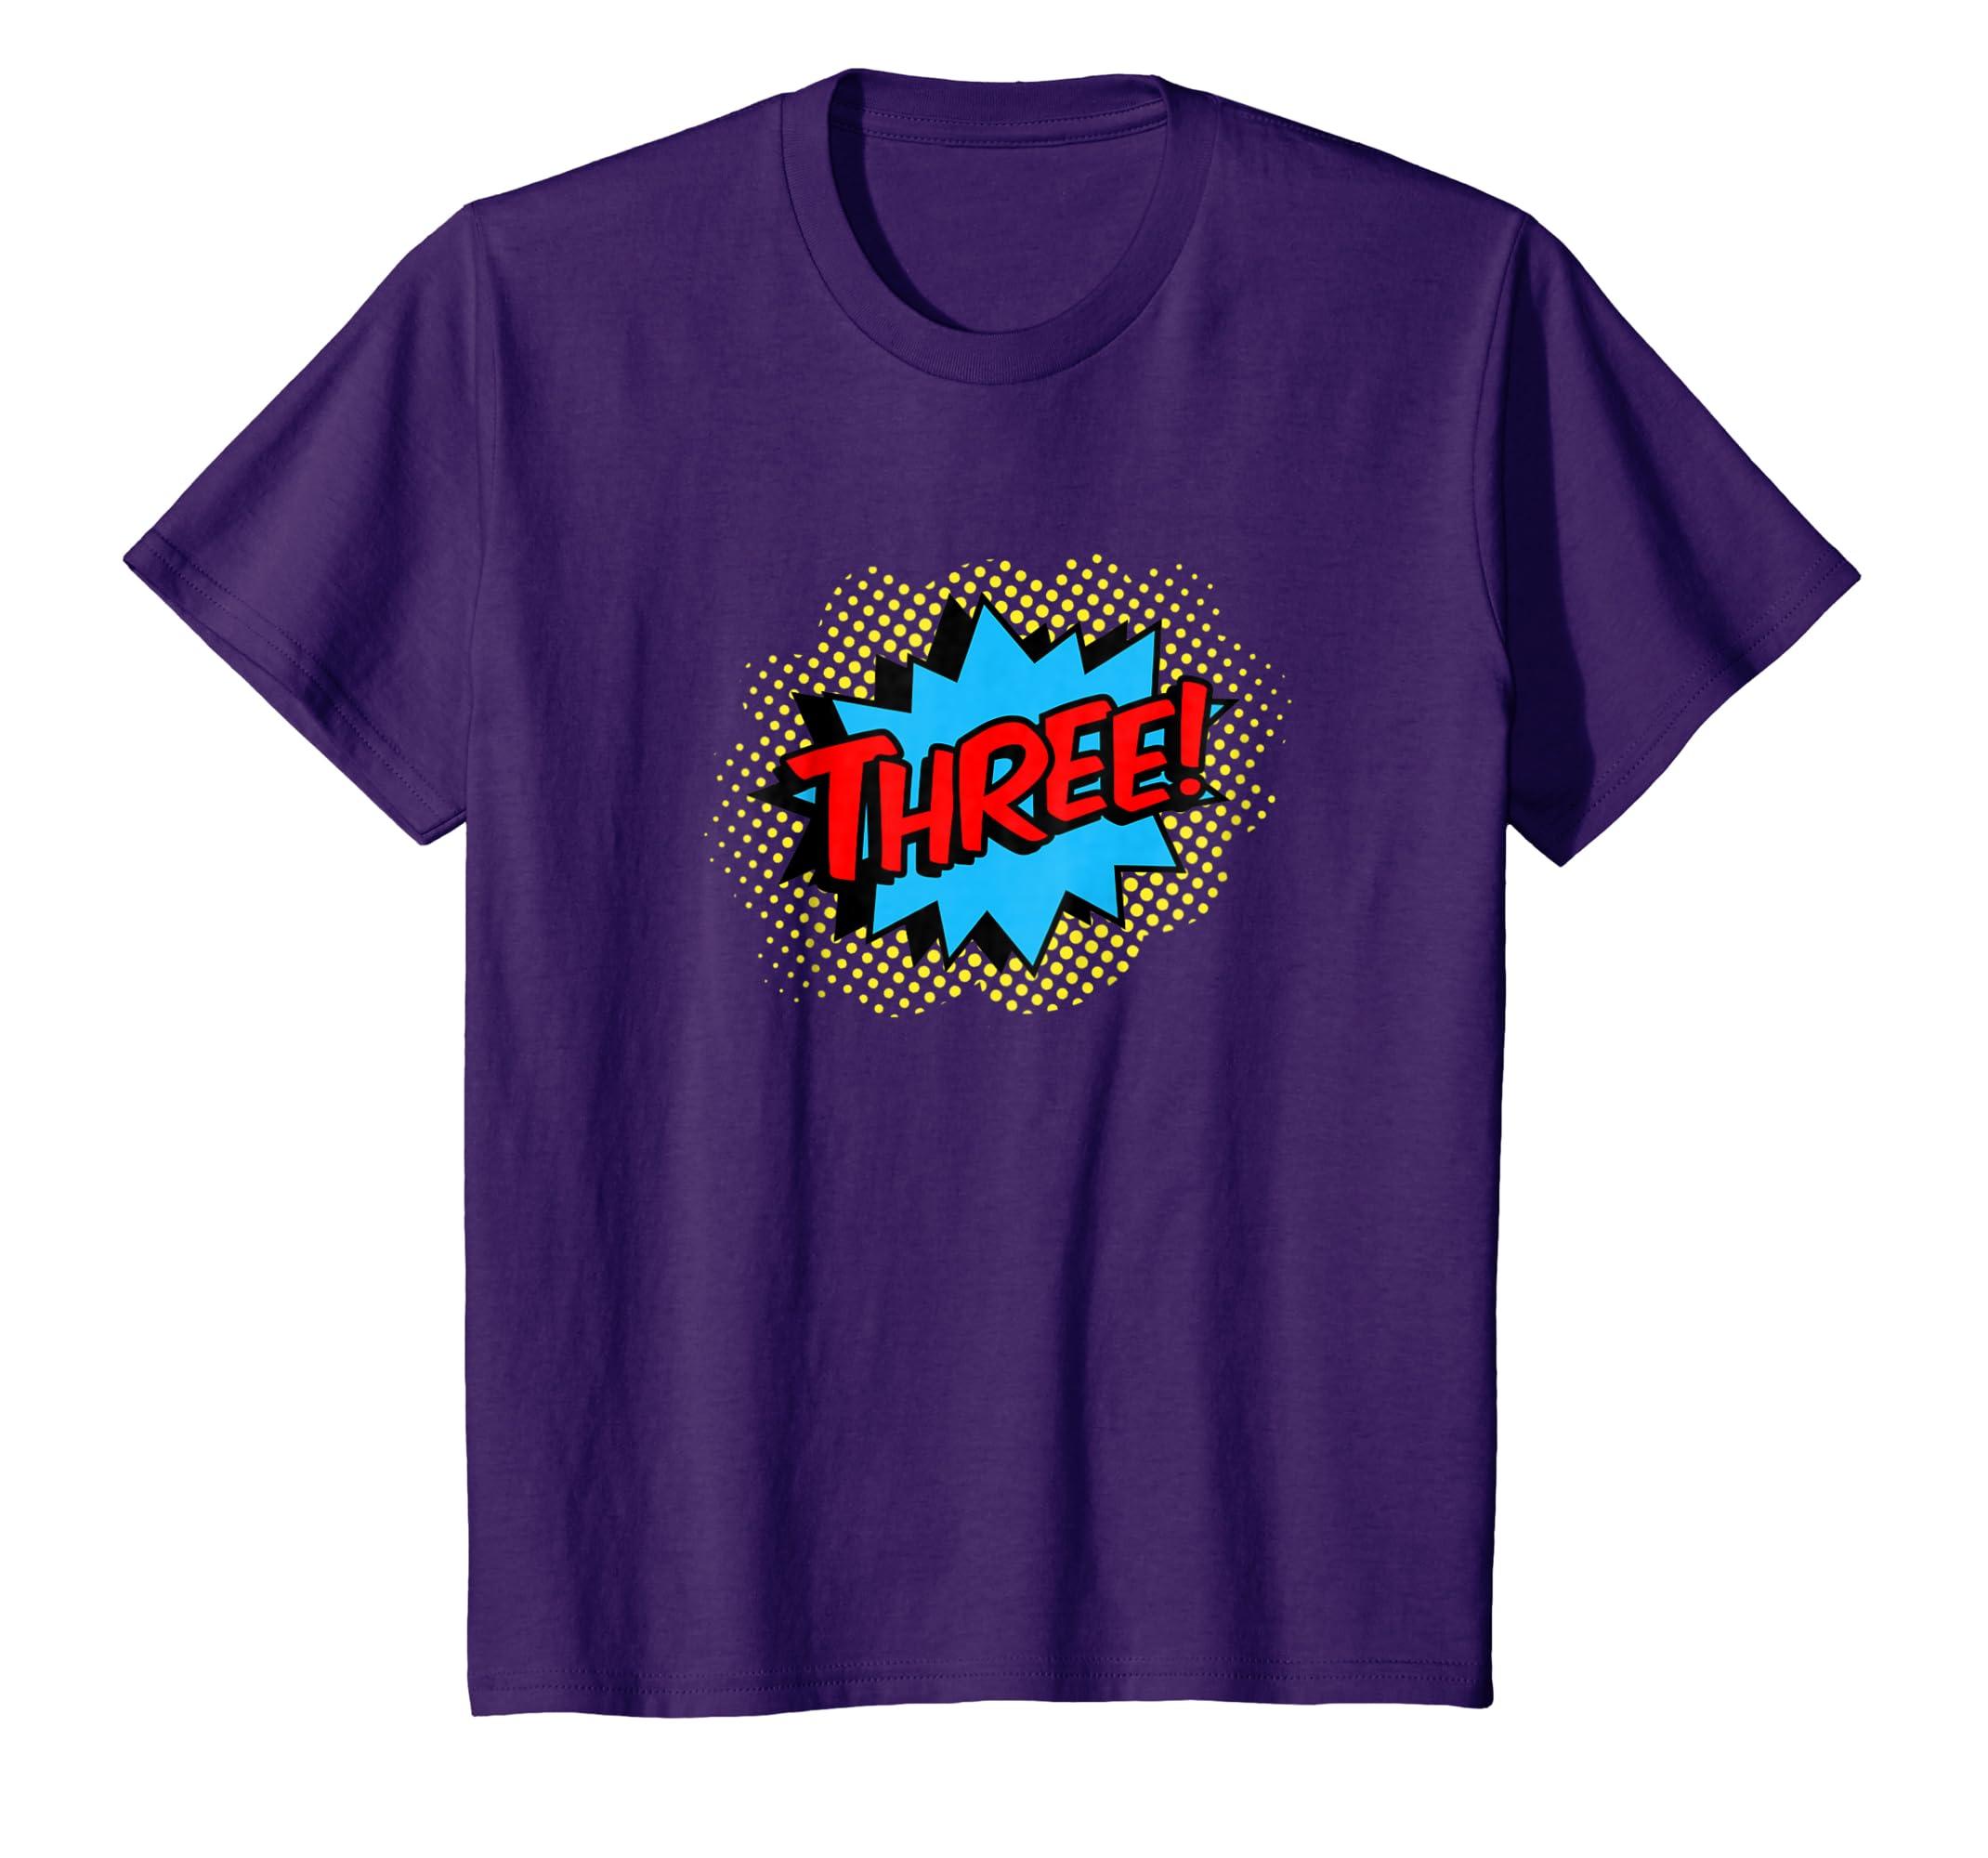 Amazon Kids Happy 3rd Birthday THREE T Shirt For Boys Girls 3 Yrs Old Clothing